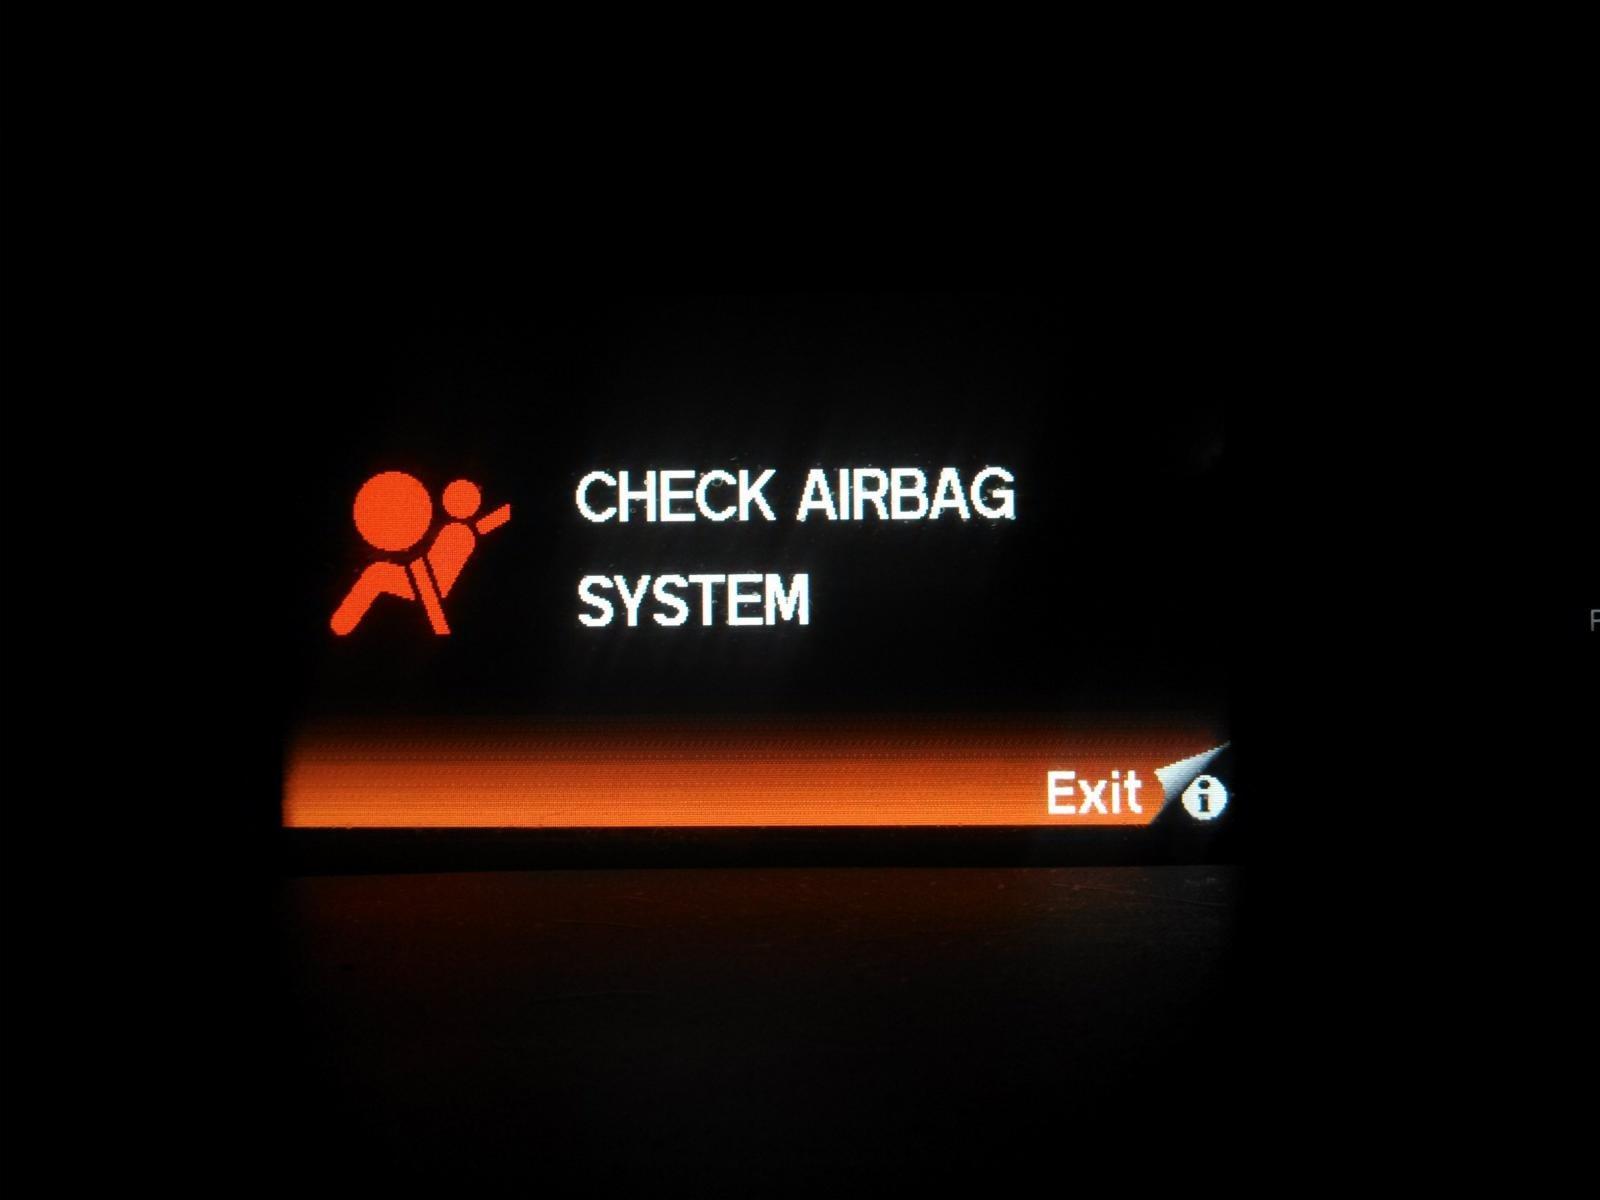 Elegant ... 2012 Honda Civic LX Sedan   Stupid SRS Passenger Airbag Light   NO  ACCIDENT Img_20140423_204009